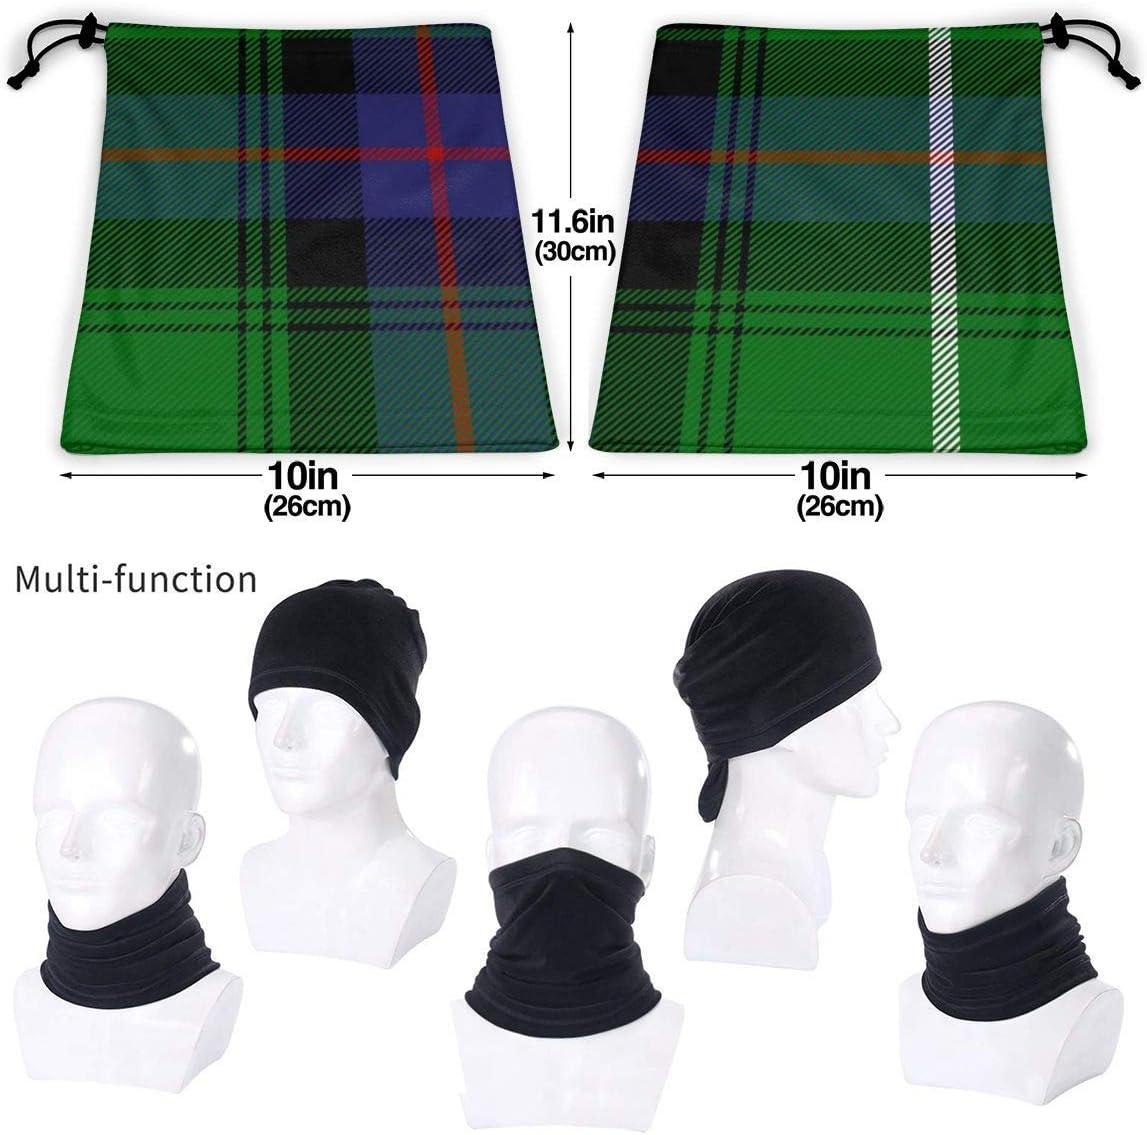 WCUTE Macdonald Tartan Scottish Cage Background3 Seamless Bandanas Headband Multifunctional Balaclava Scarf Headwear Neck Gaiter for Dust Protection